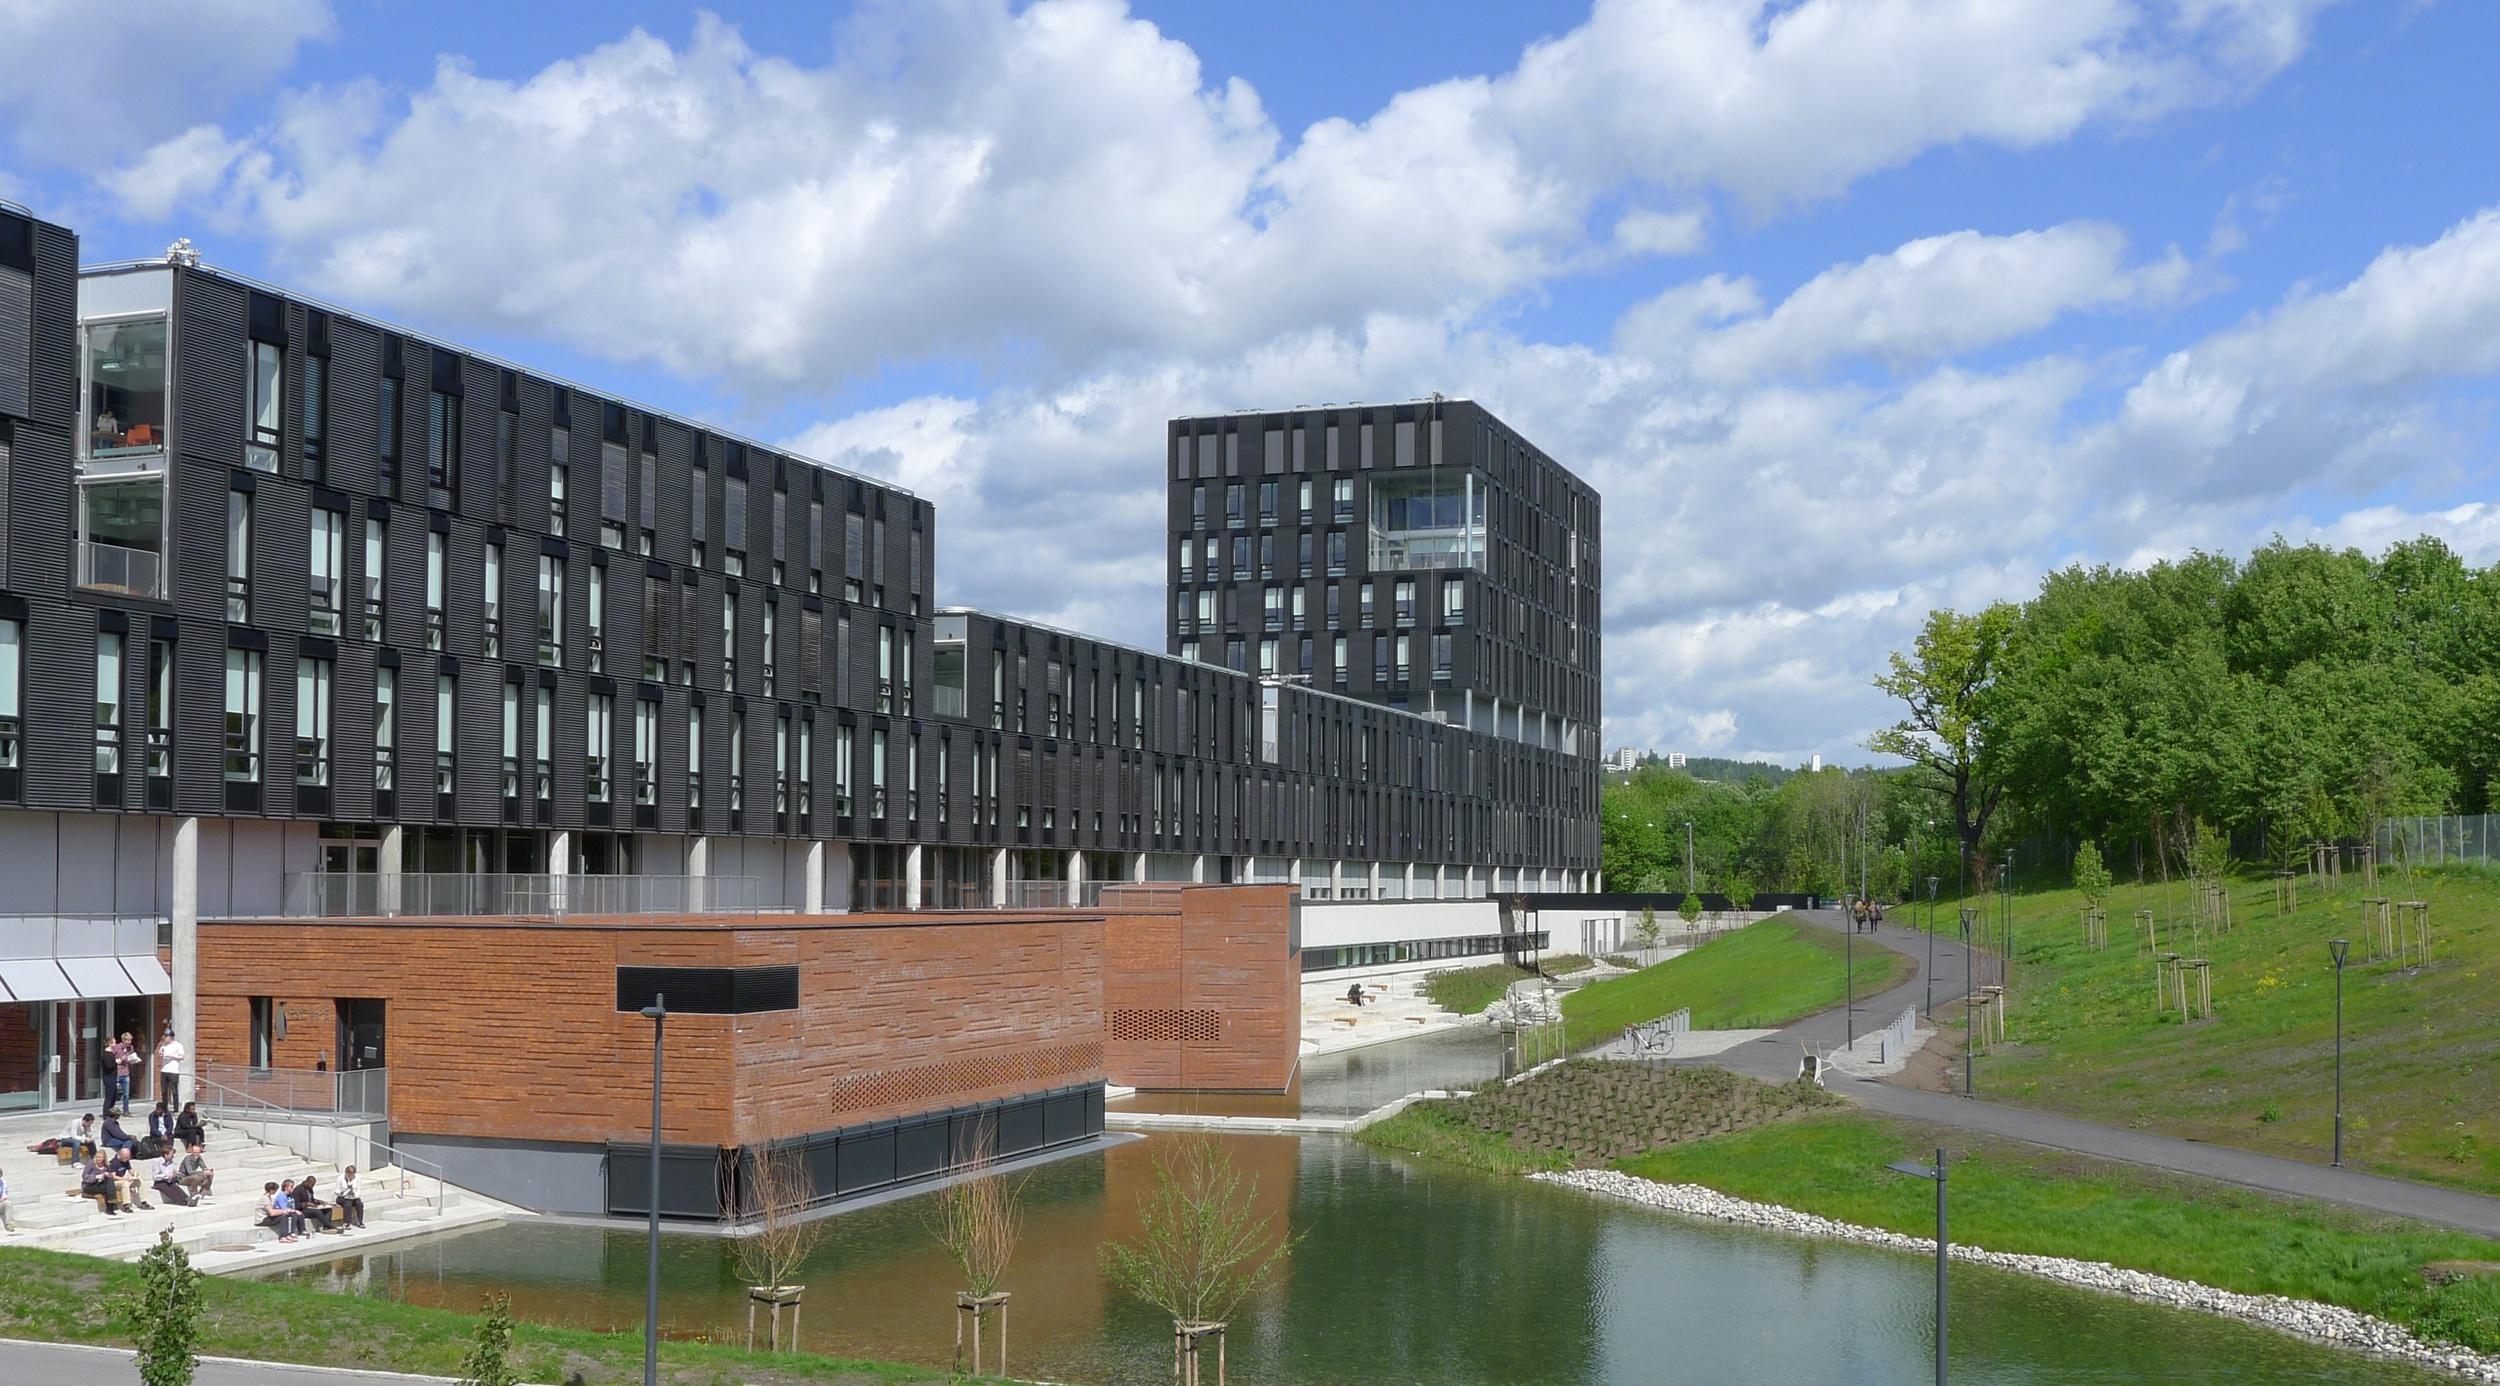 The informatics building at Blindern campus.